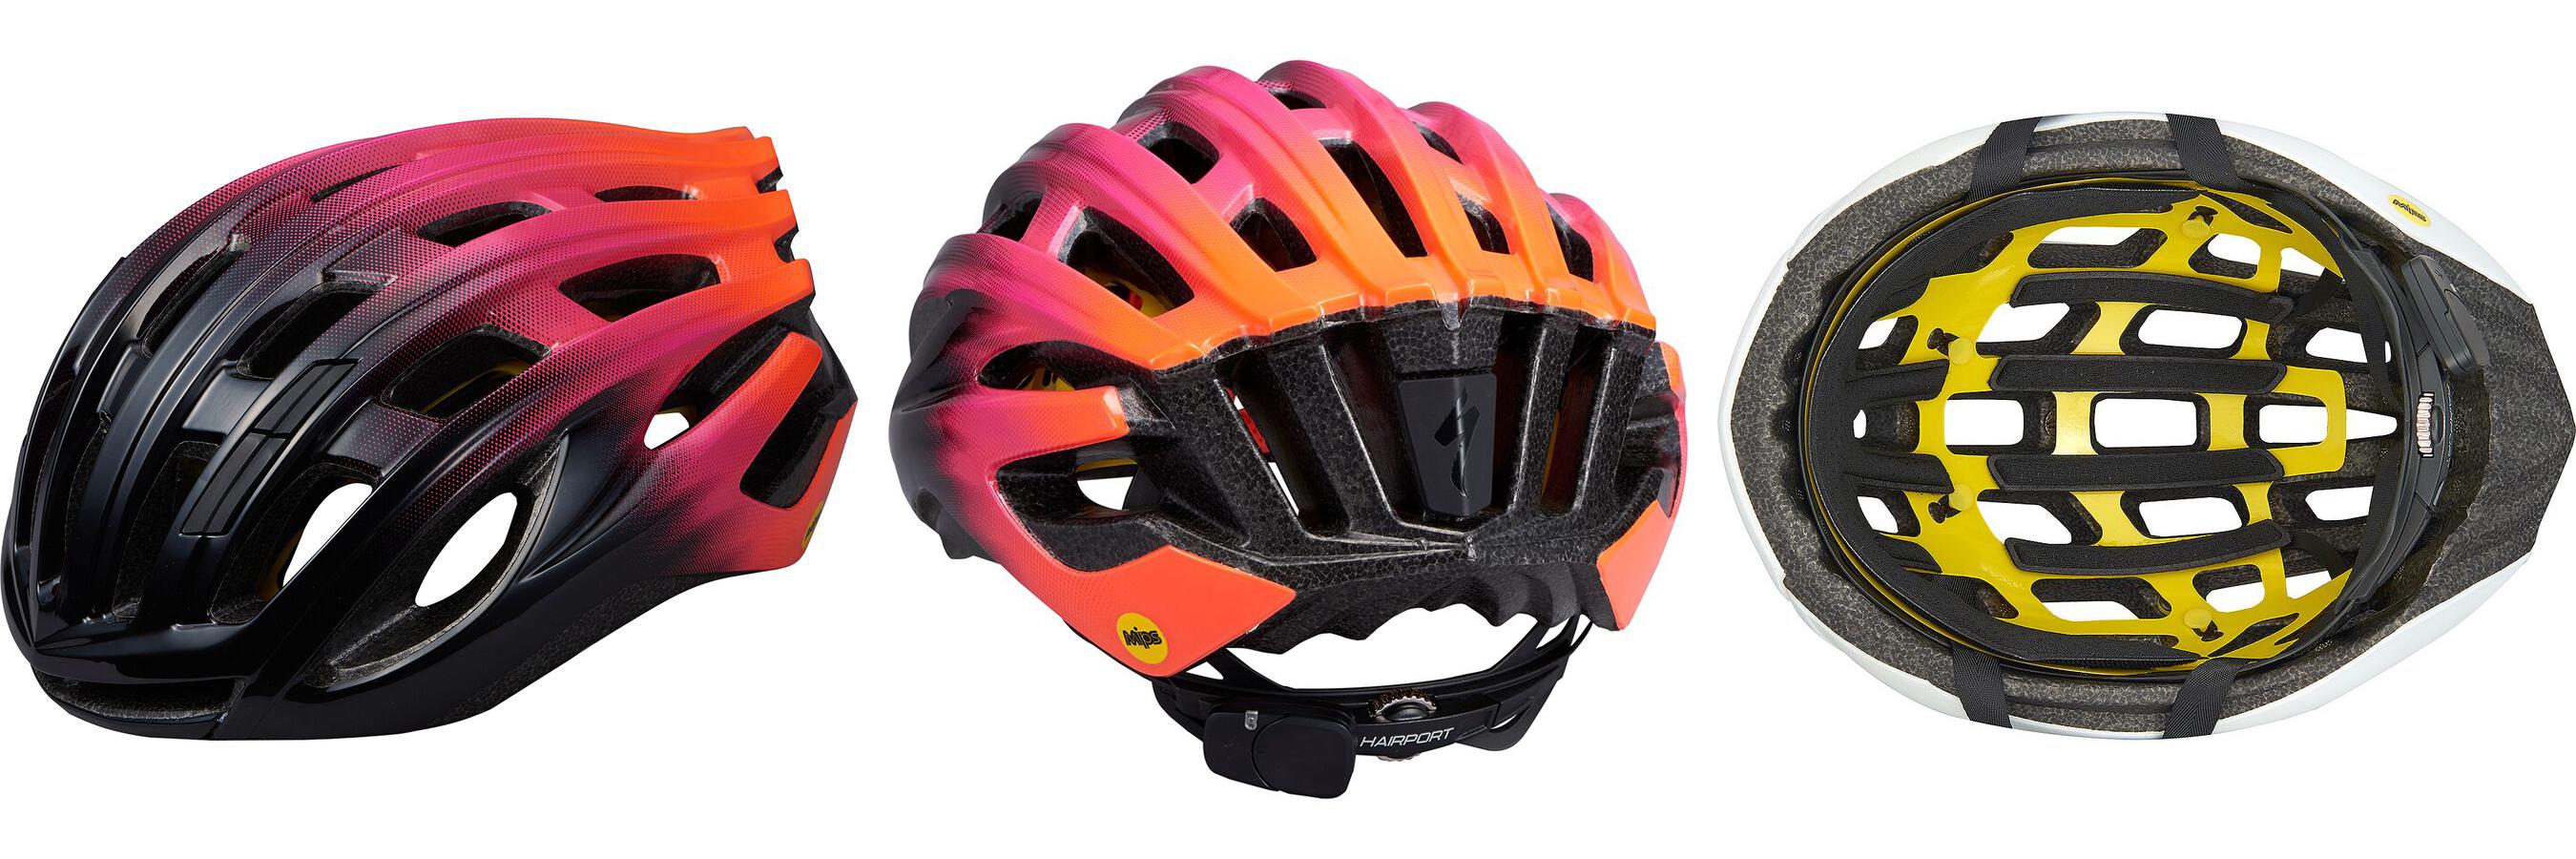 specialized propero III angi mips helmet